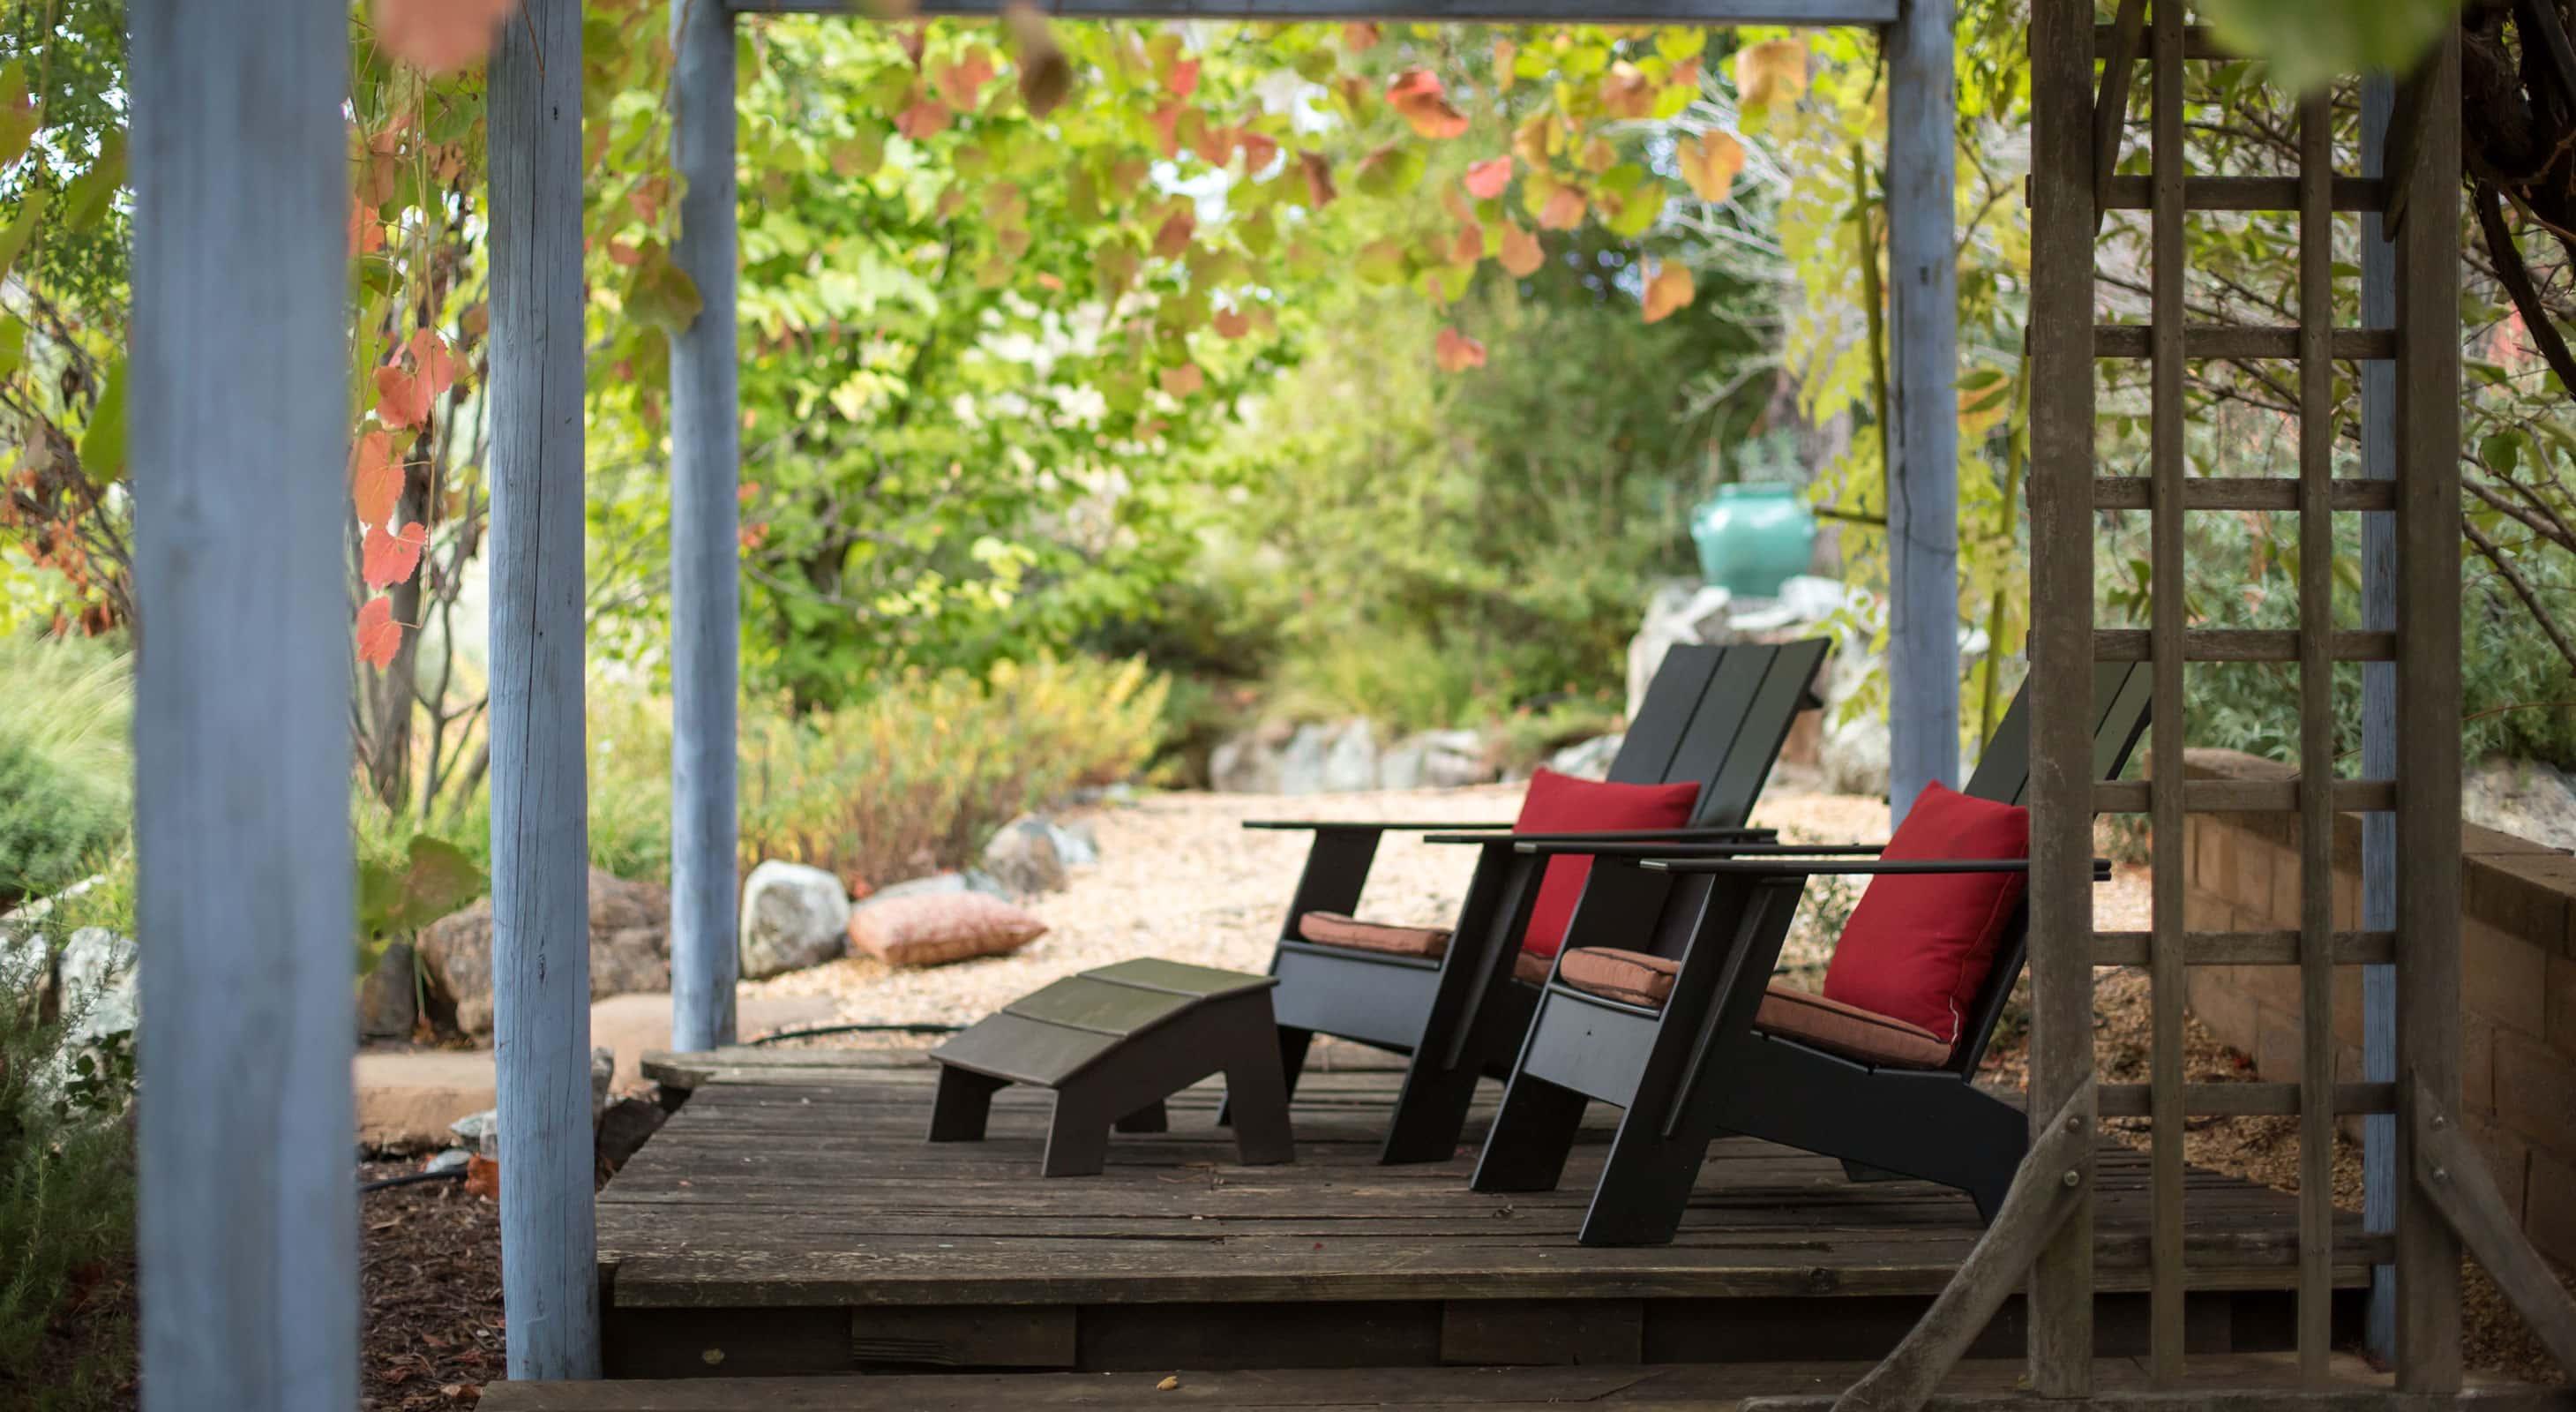 Outdoor sitting area in the Eden Vale Inn's lush garden